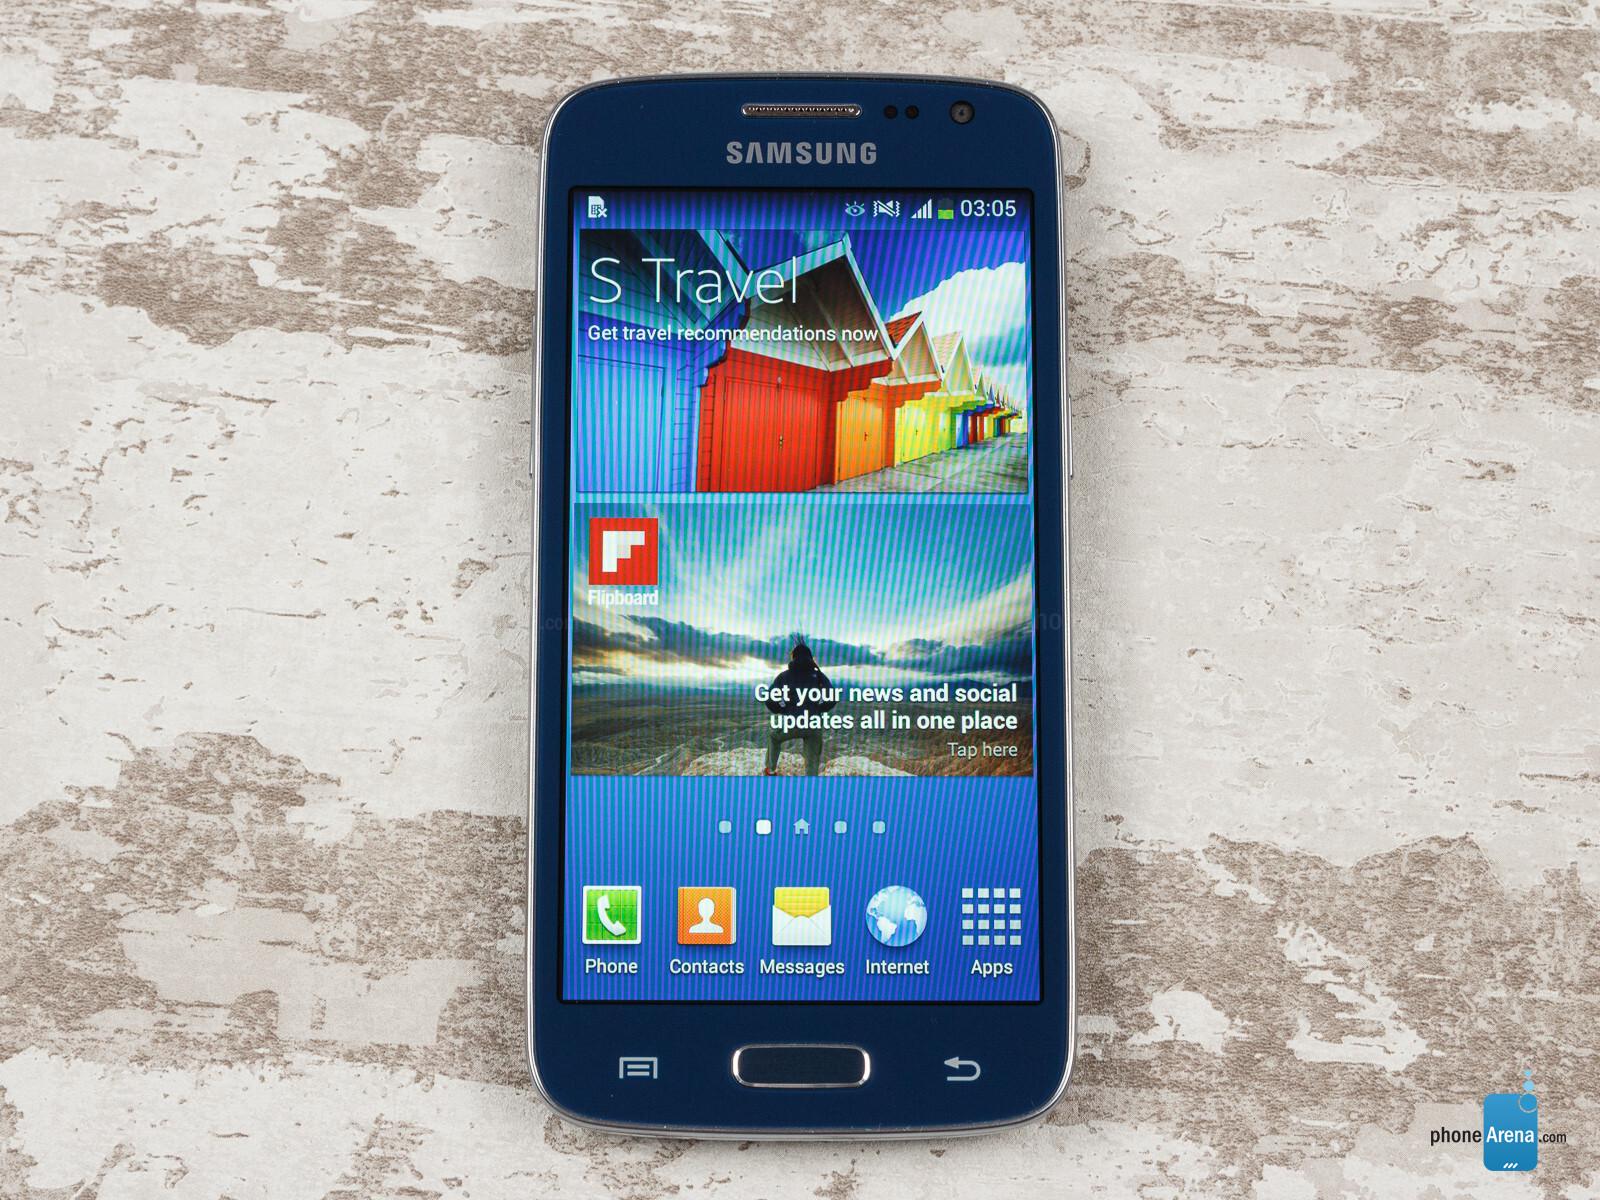 Introducing the Samsung Galaxy J3